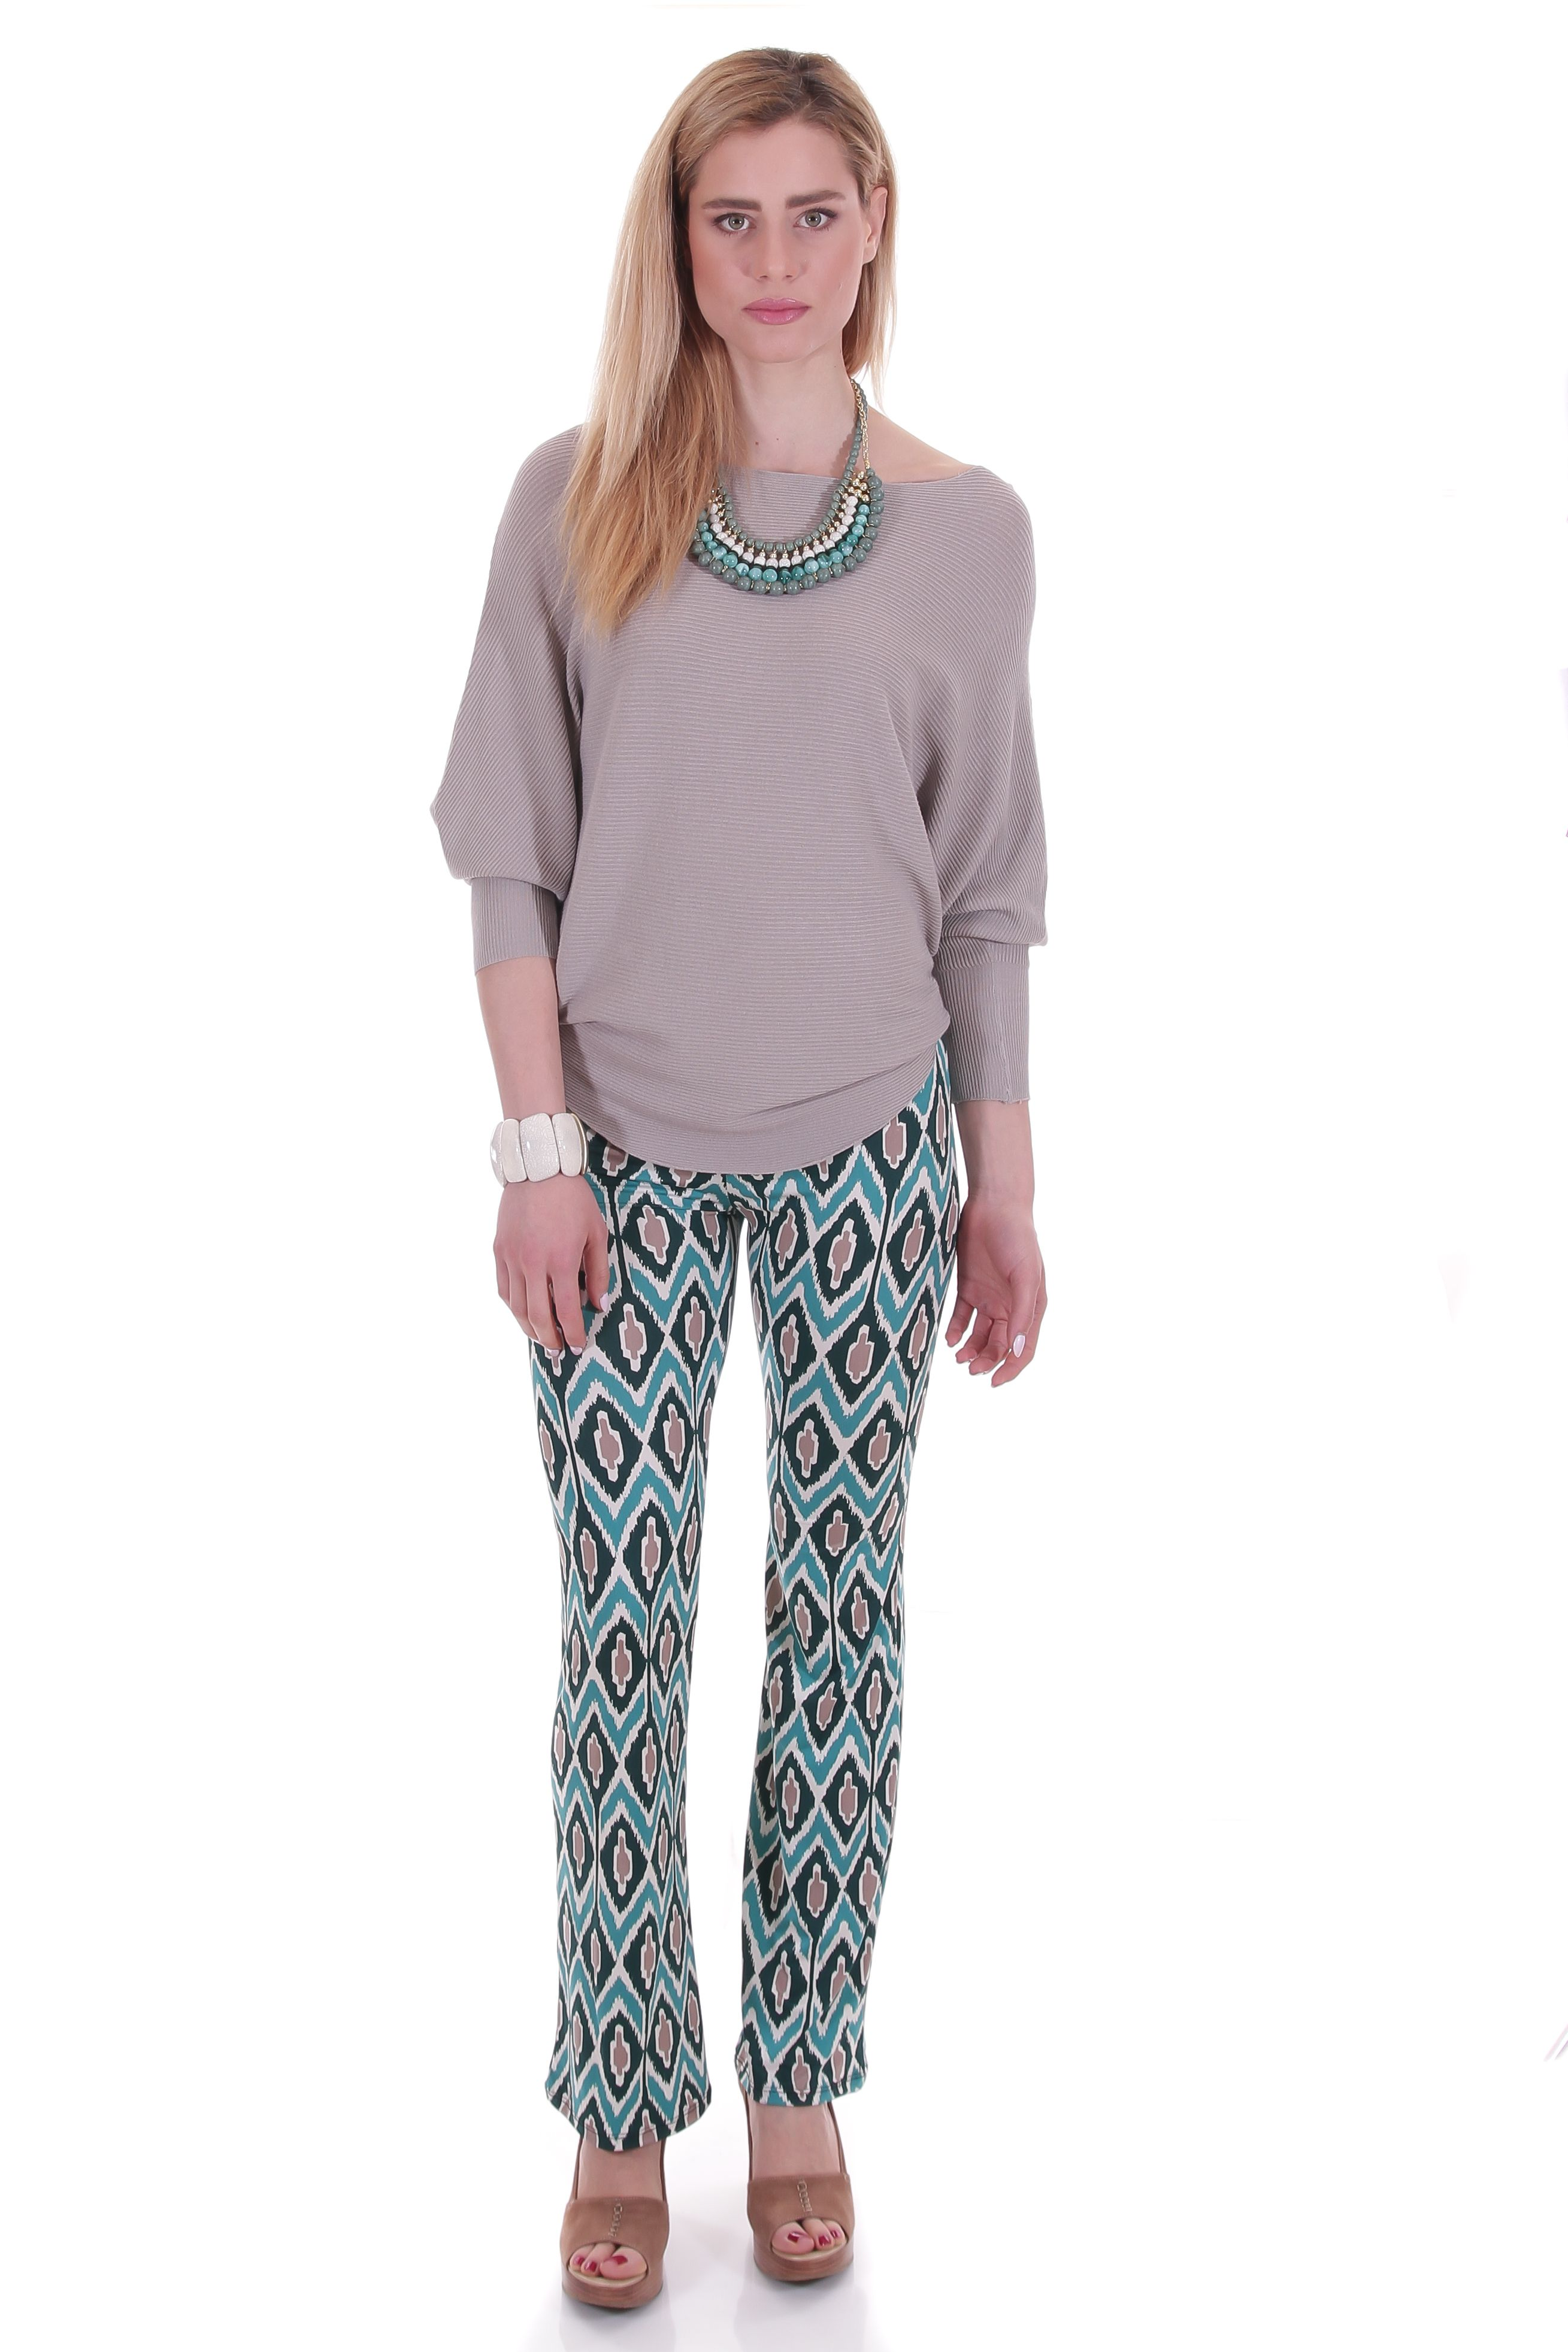 #SS_14#I_heart_vardas# fashion